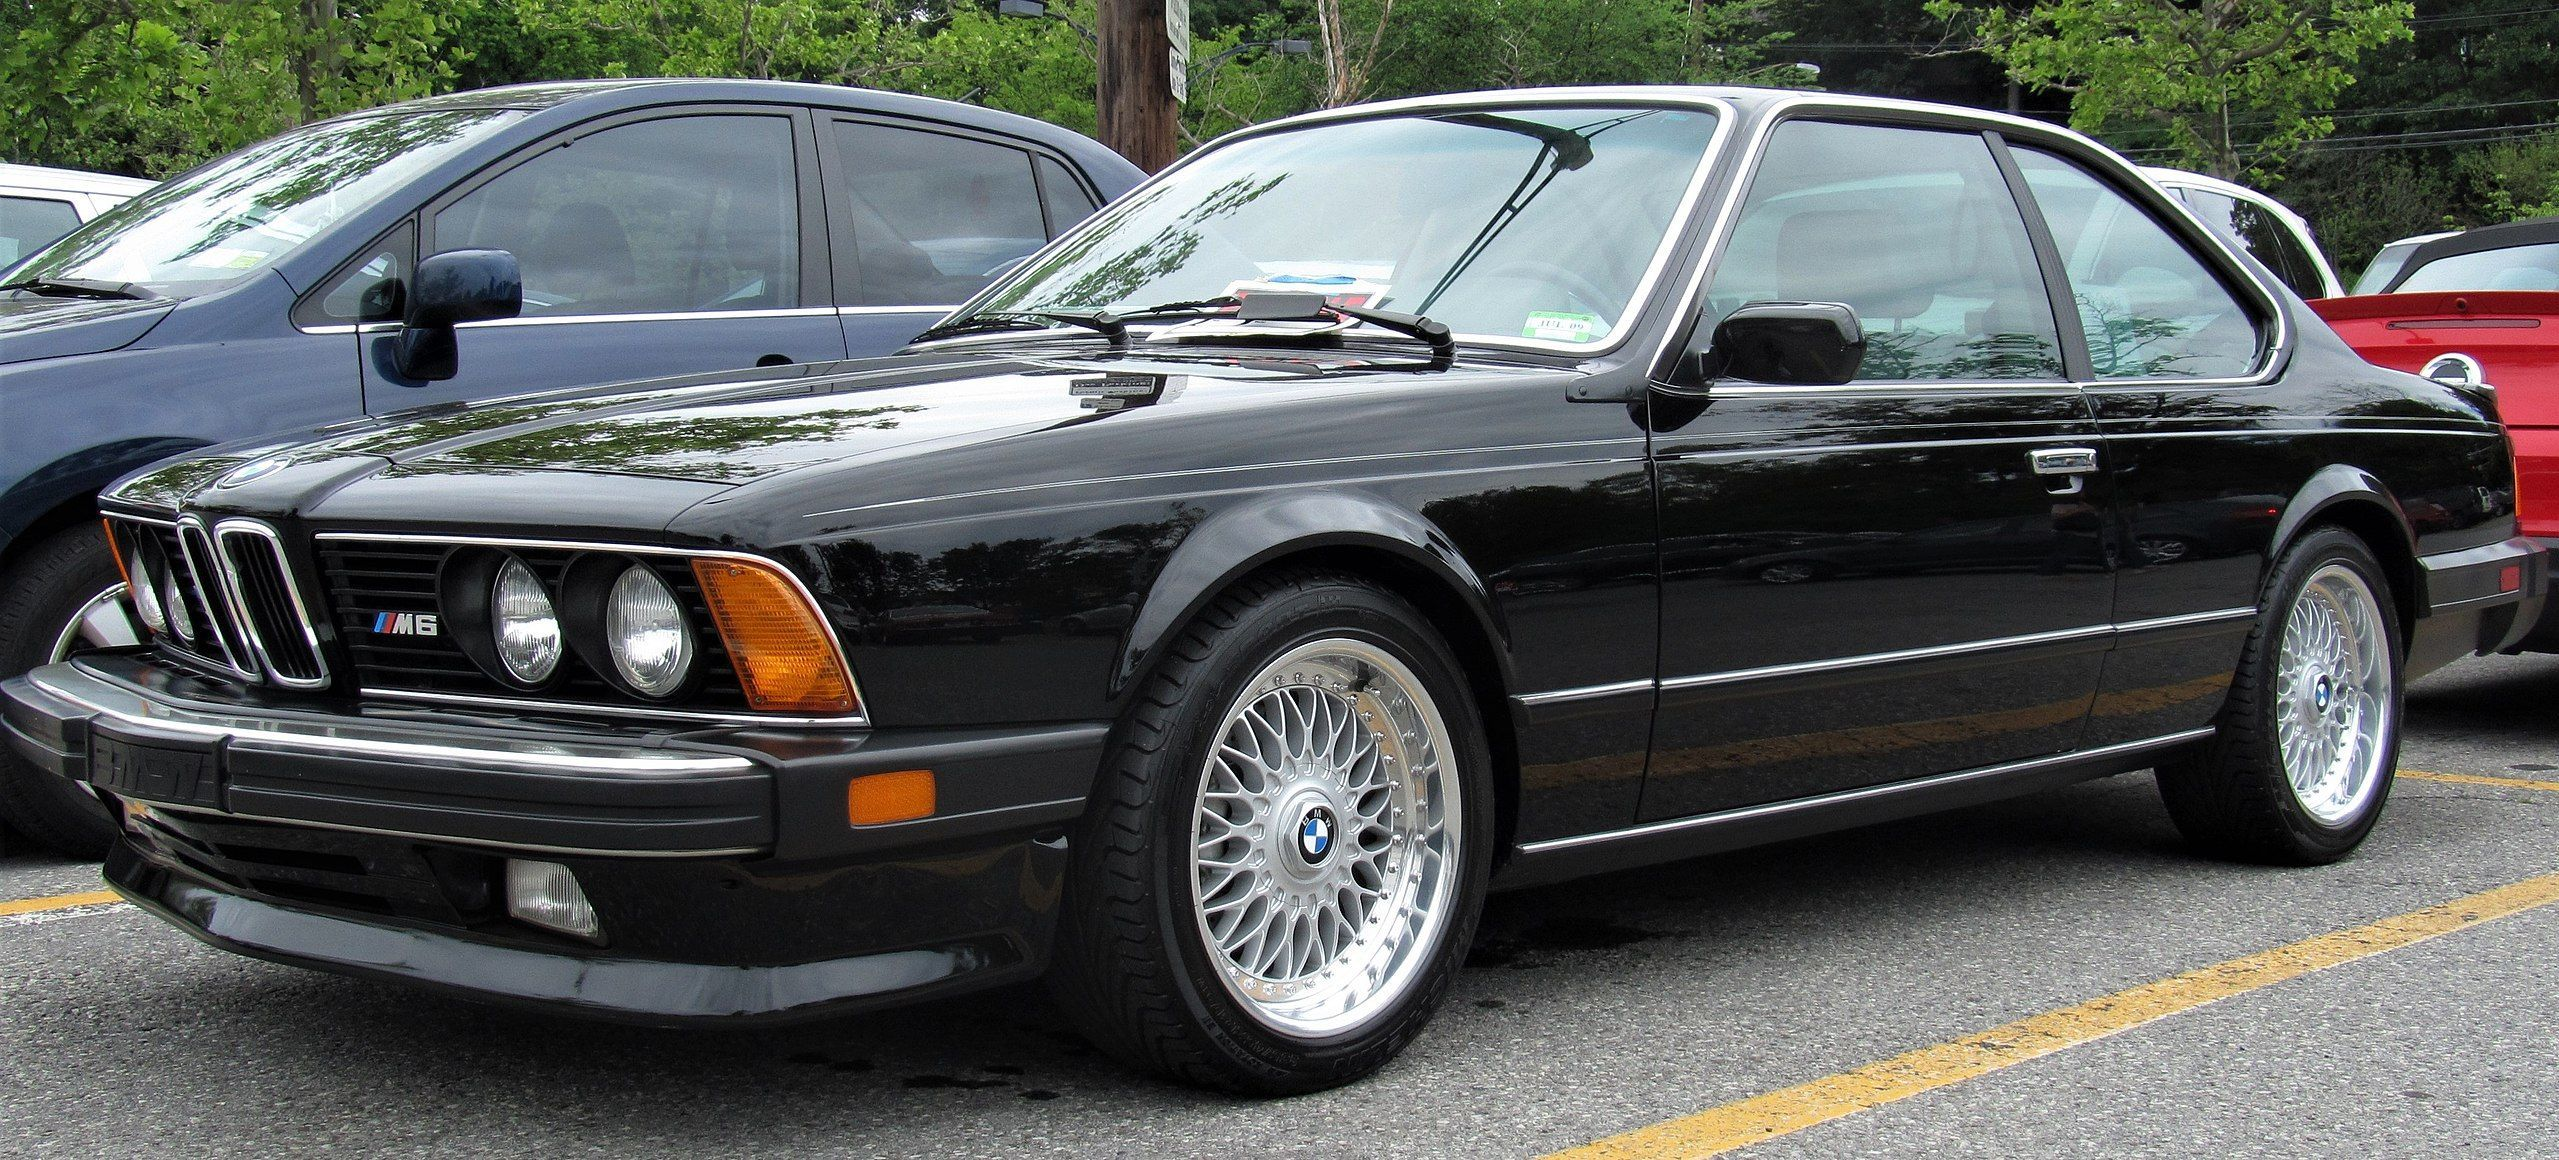 1987 E24 Bmw M6 Bmw Vintage Bmw Classic Cars Bmw E24